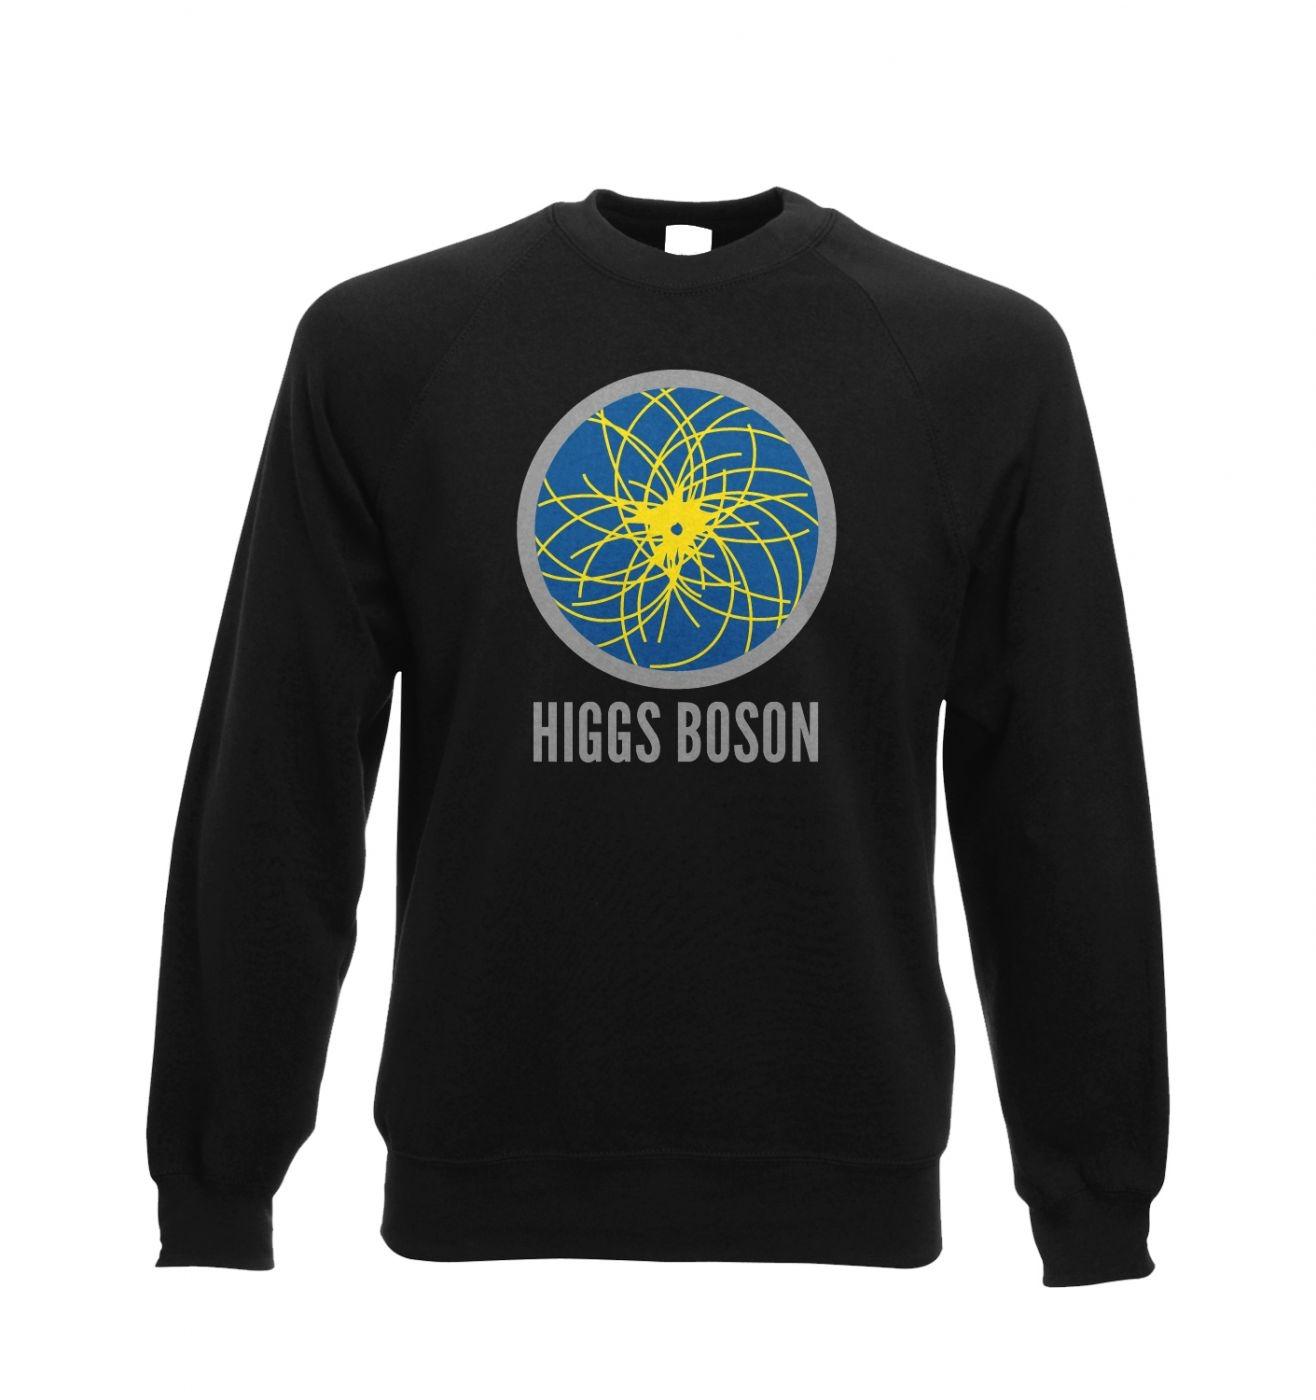 Higgs Boson Adult Crewneck Sweatshirt